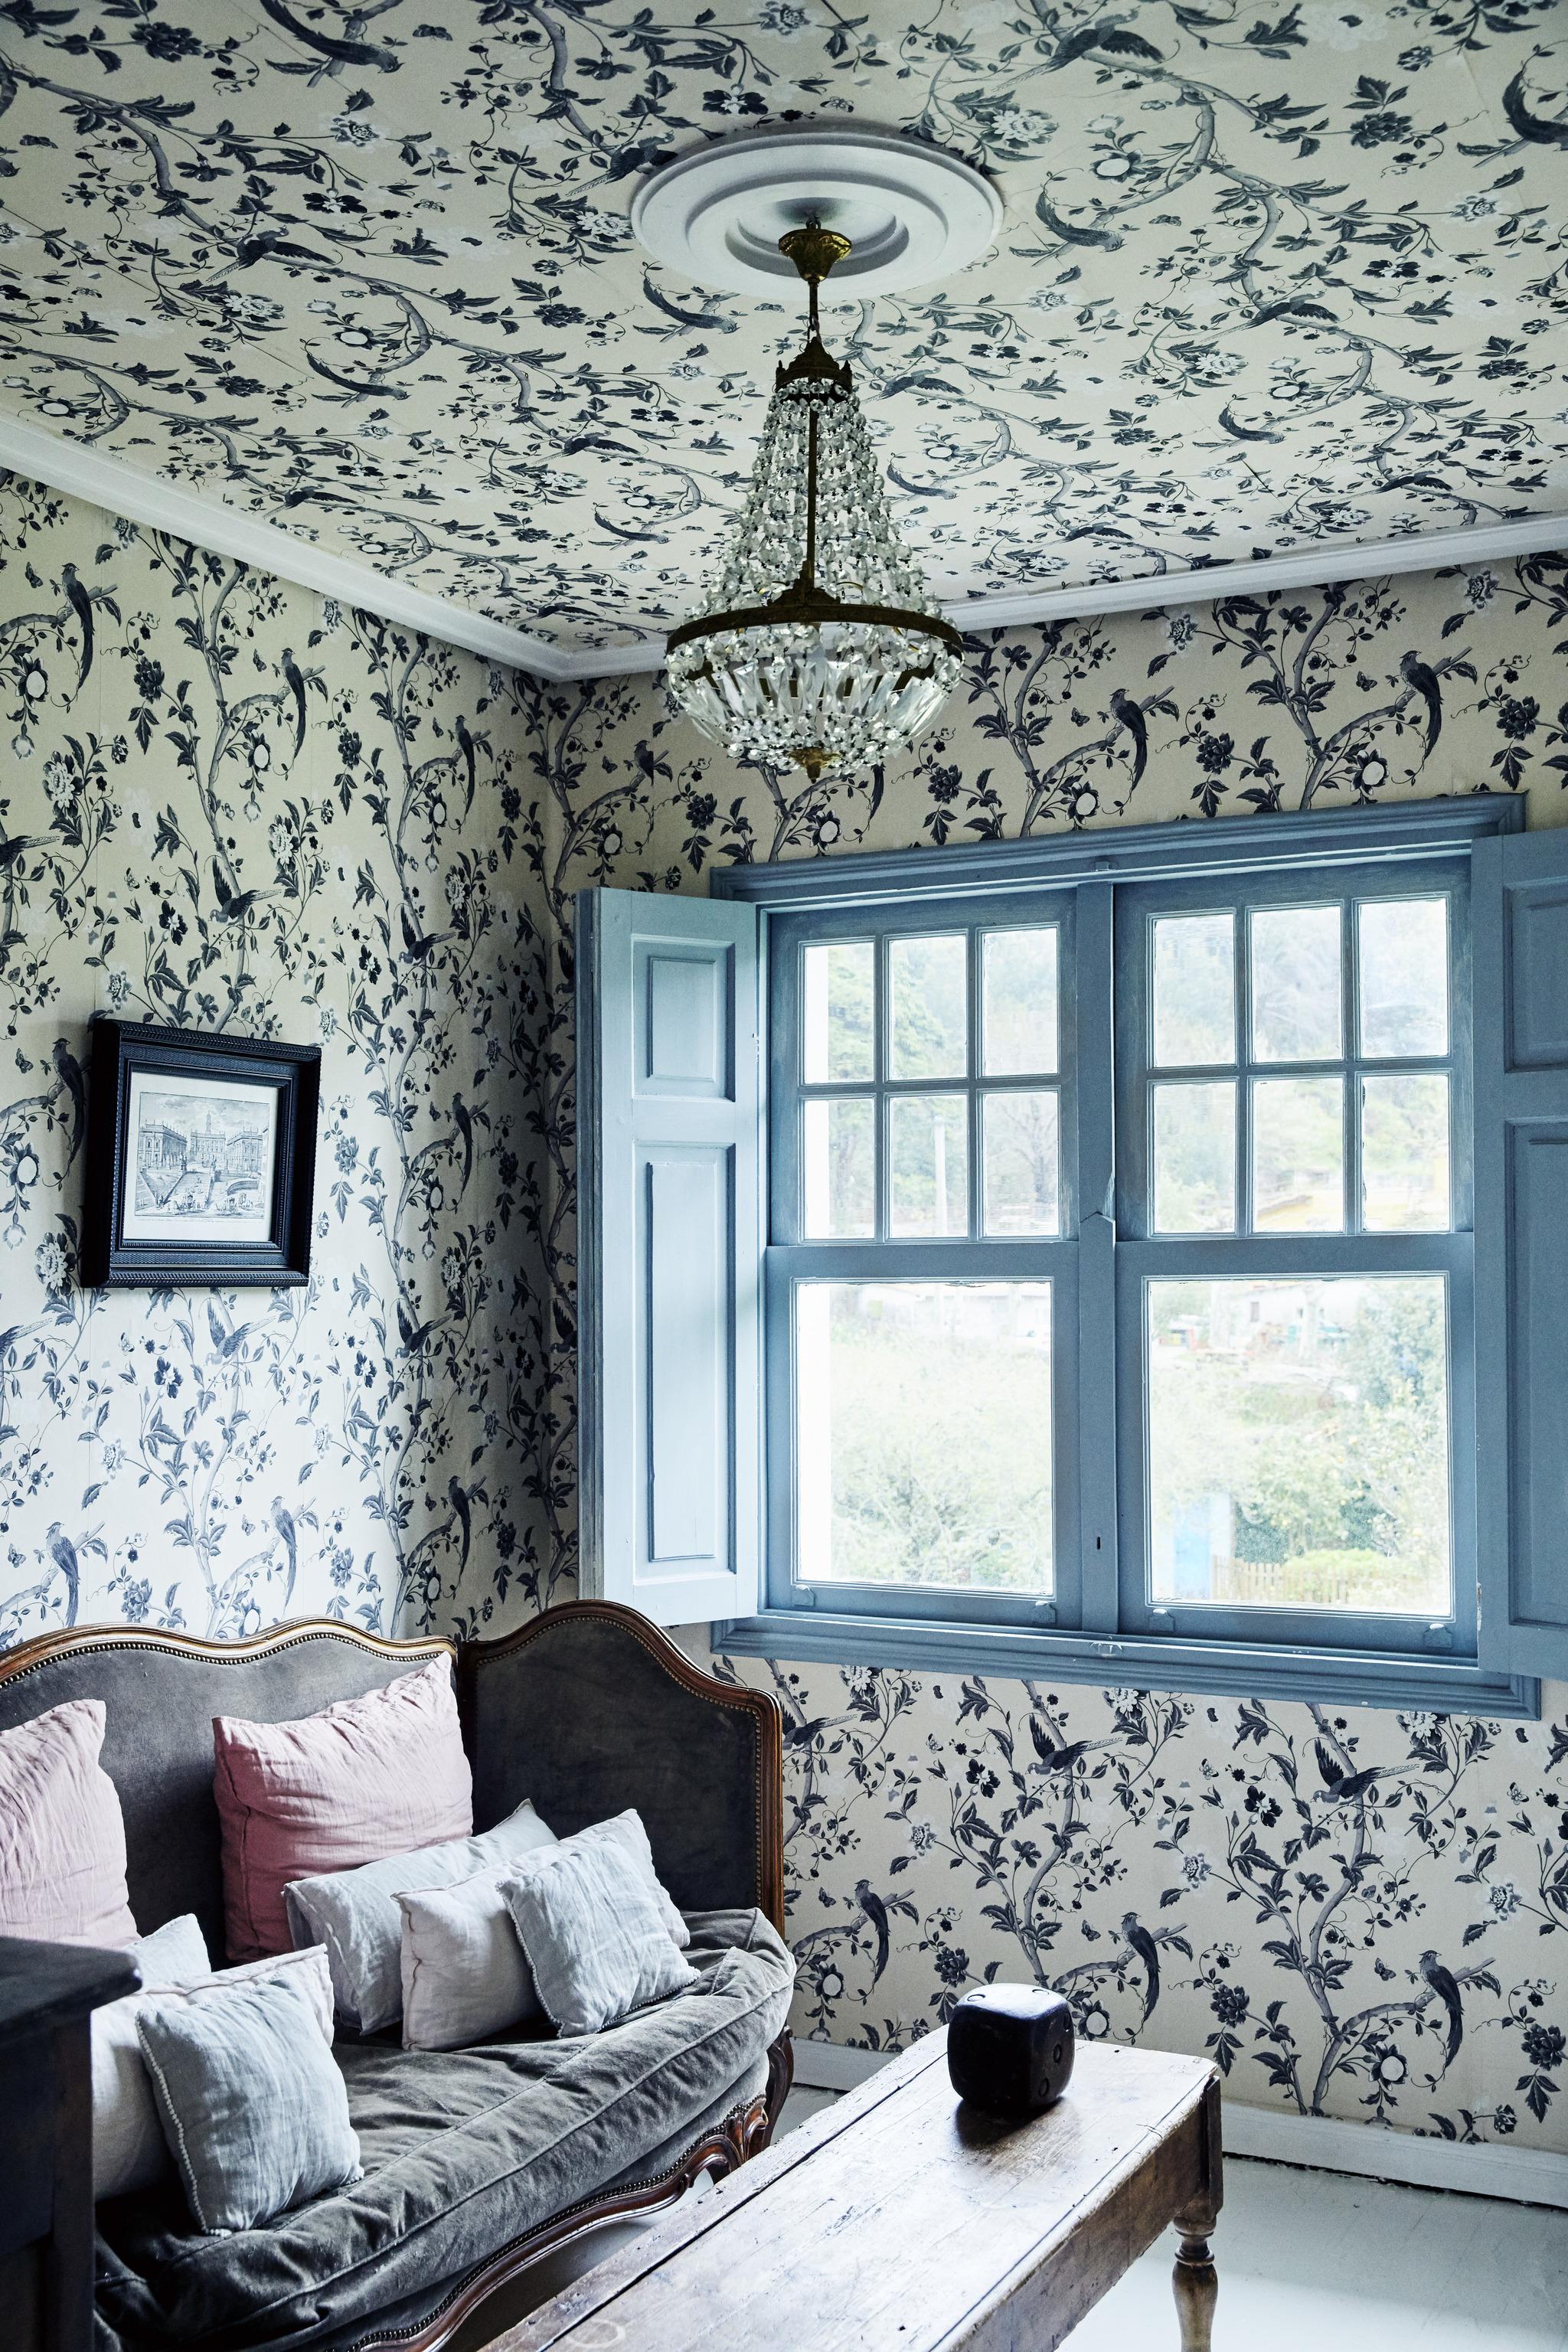 Ventila la casa durante 5 o 10 minutos. Aprovecha la luz natural.